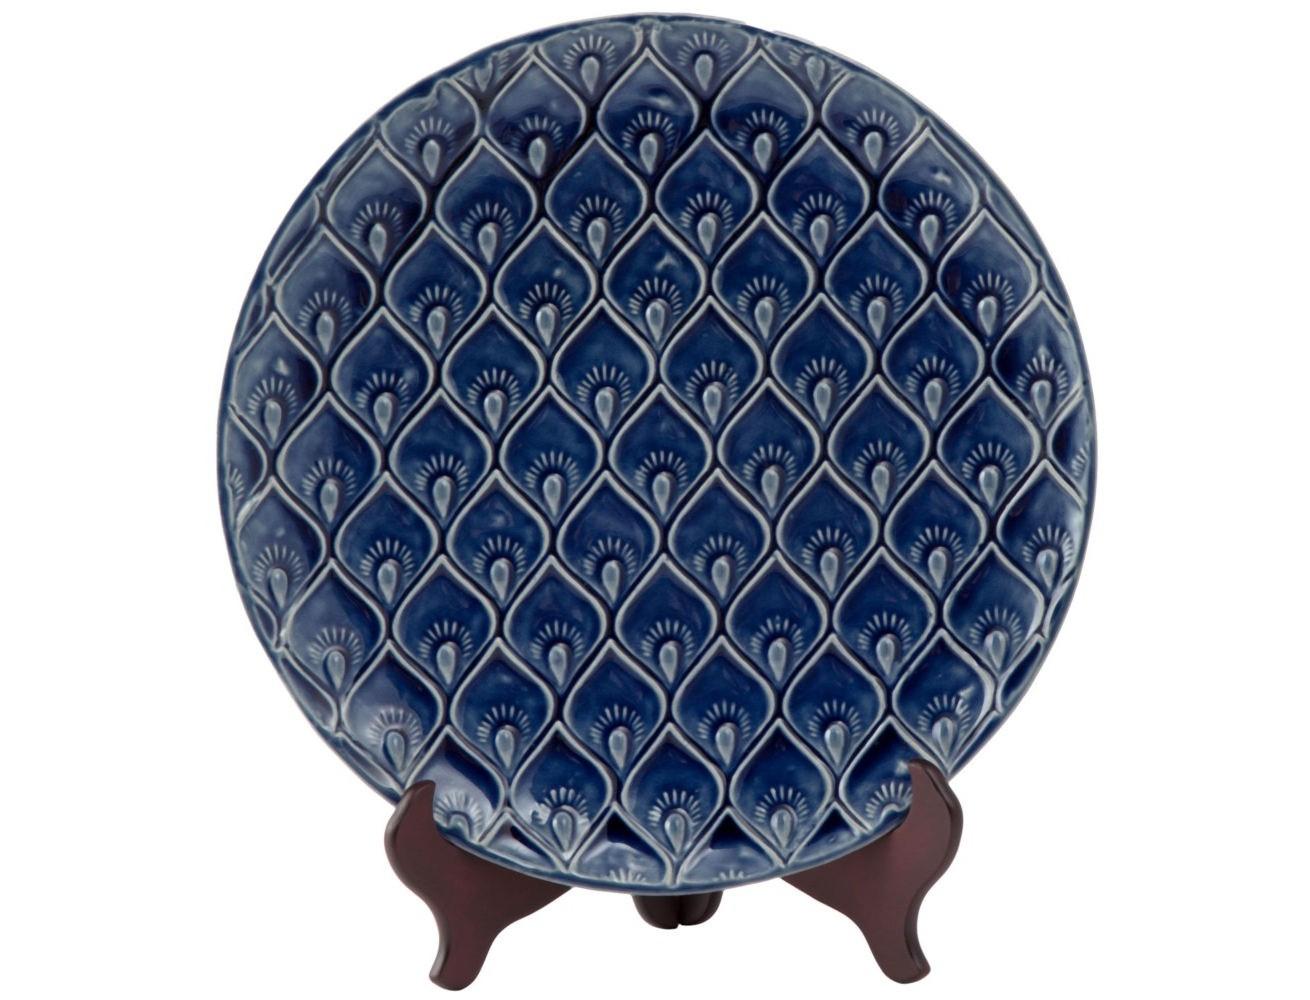 Тарелка декоративная PavoДекоративные тарелки<br><br><br>Material: Керамика